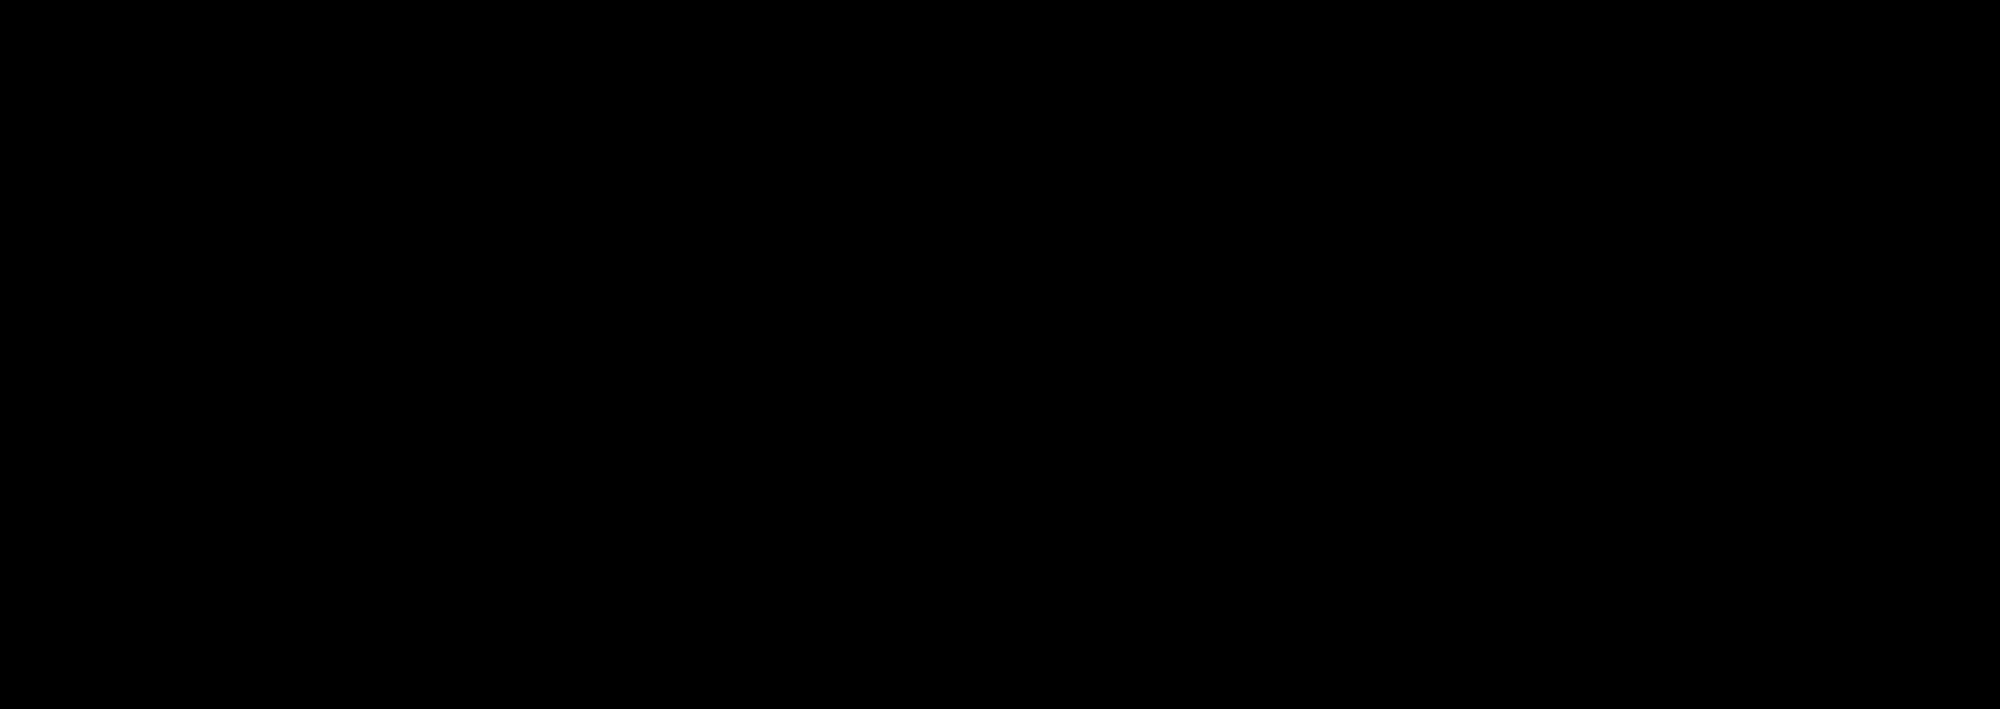 Getting Started-logo-black(5).png